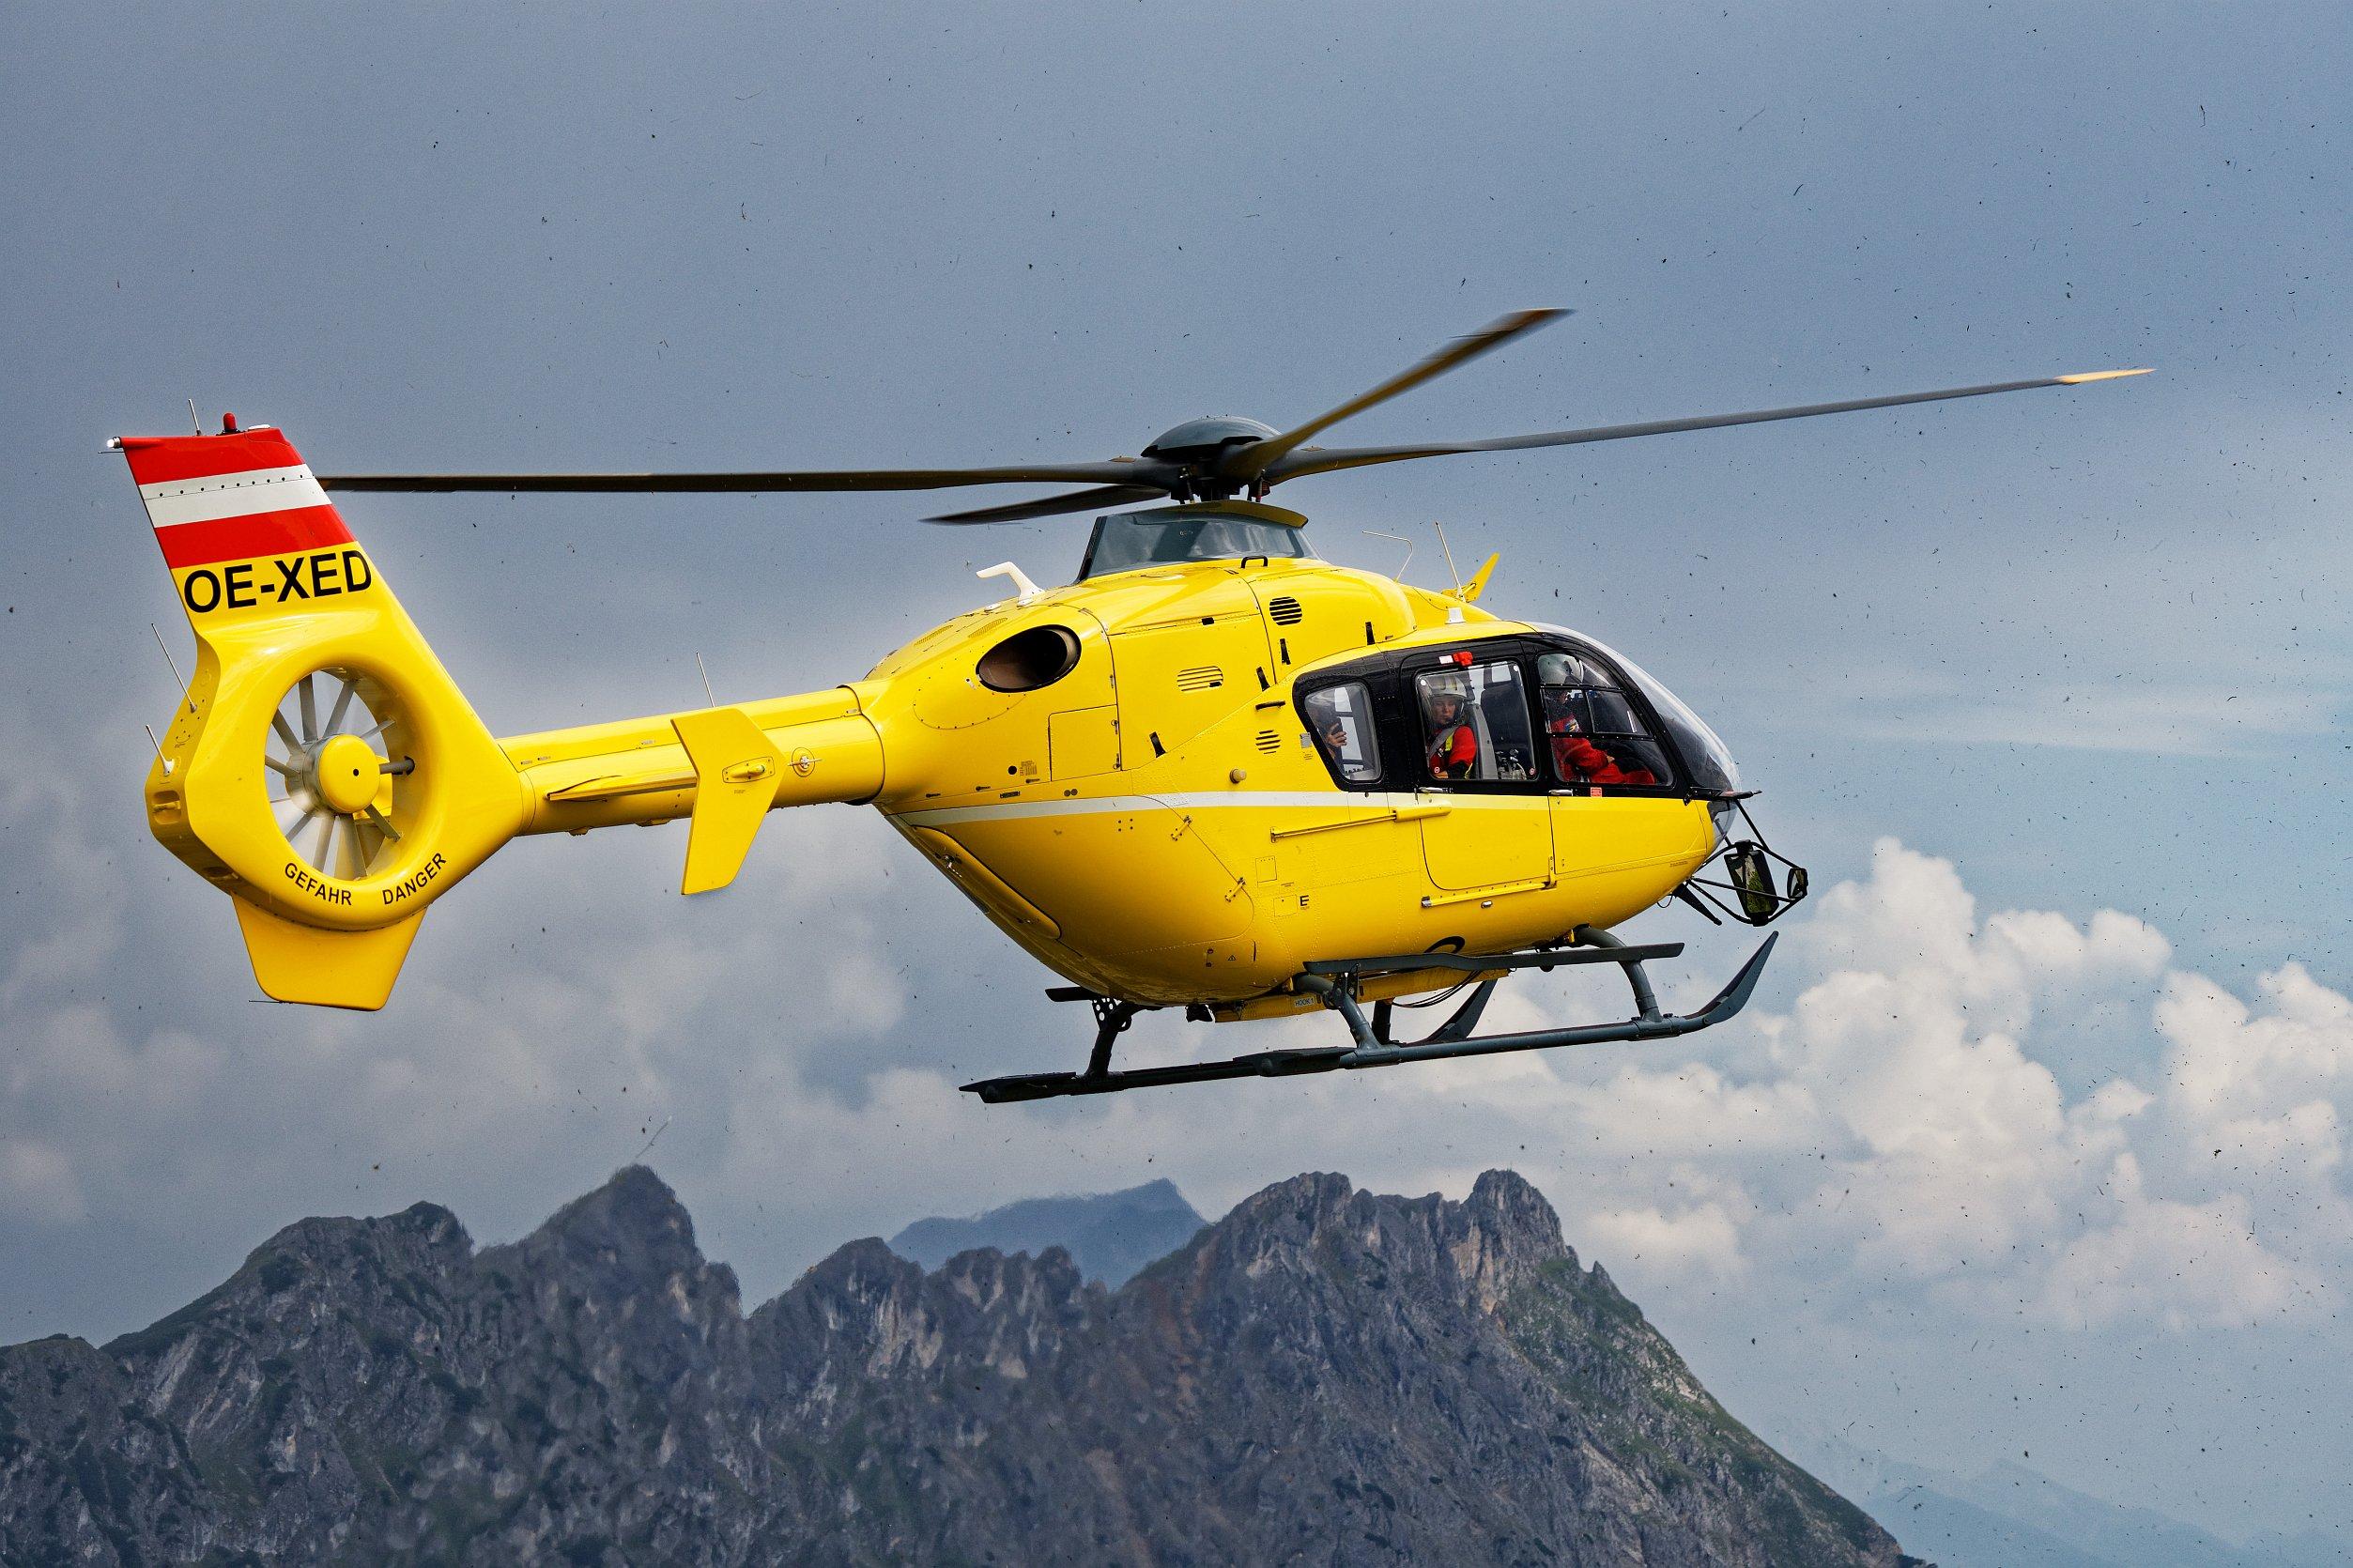 OE-XED Rettungshubschrauber 2020-08-19